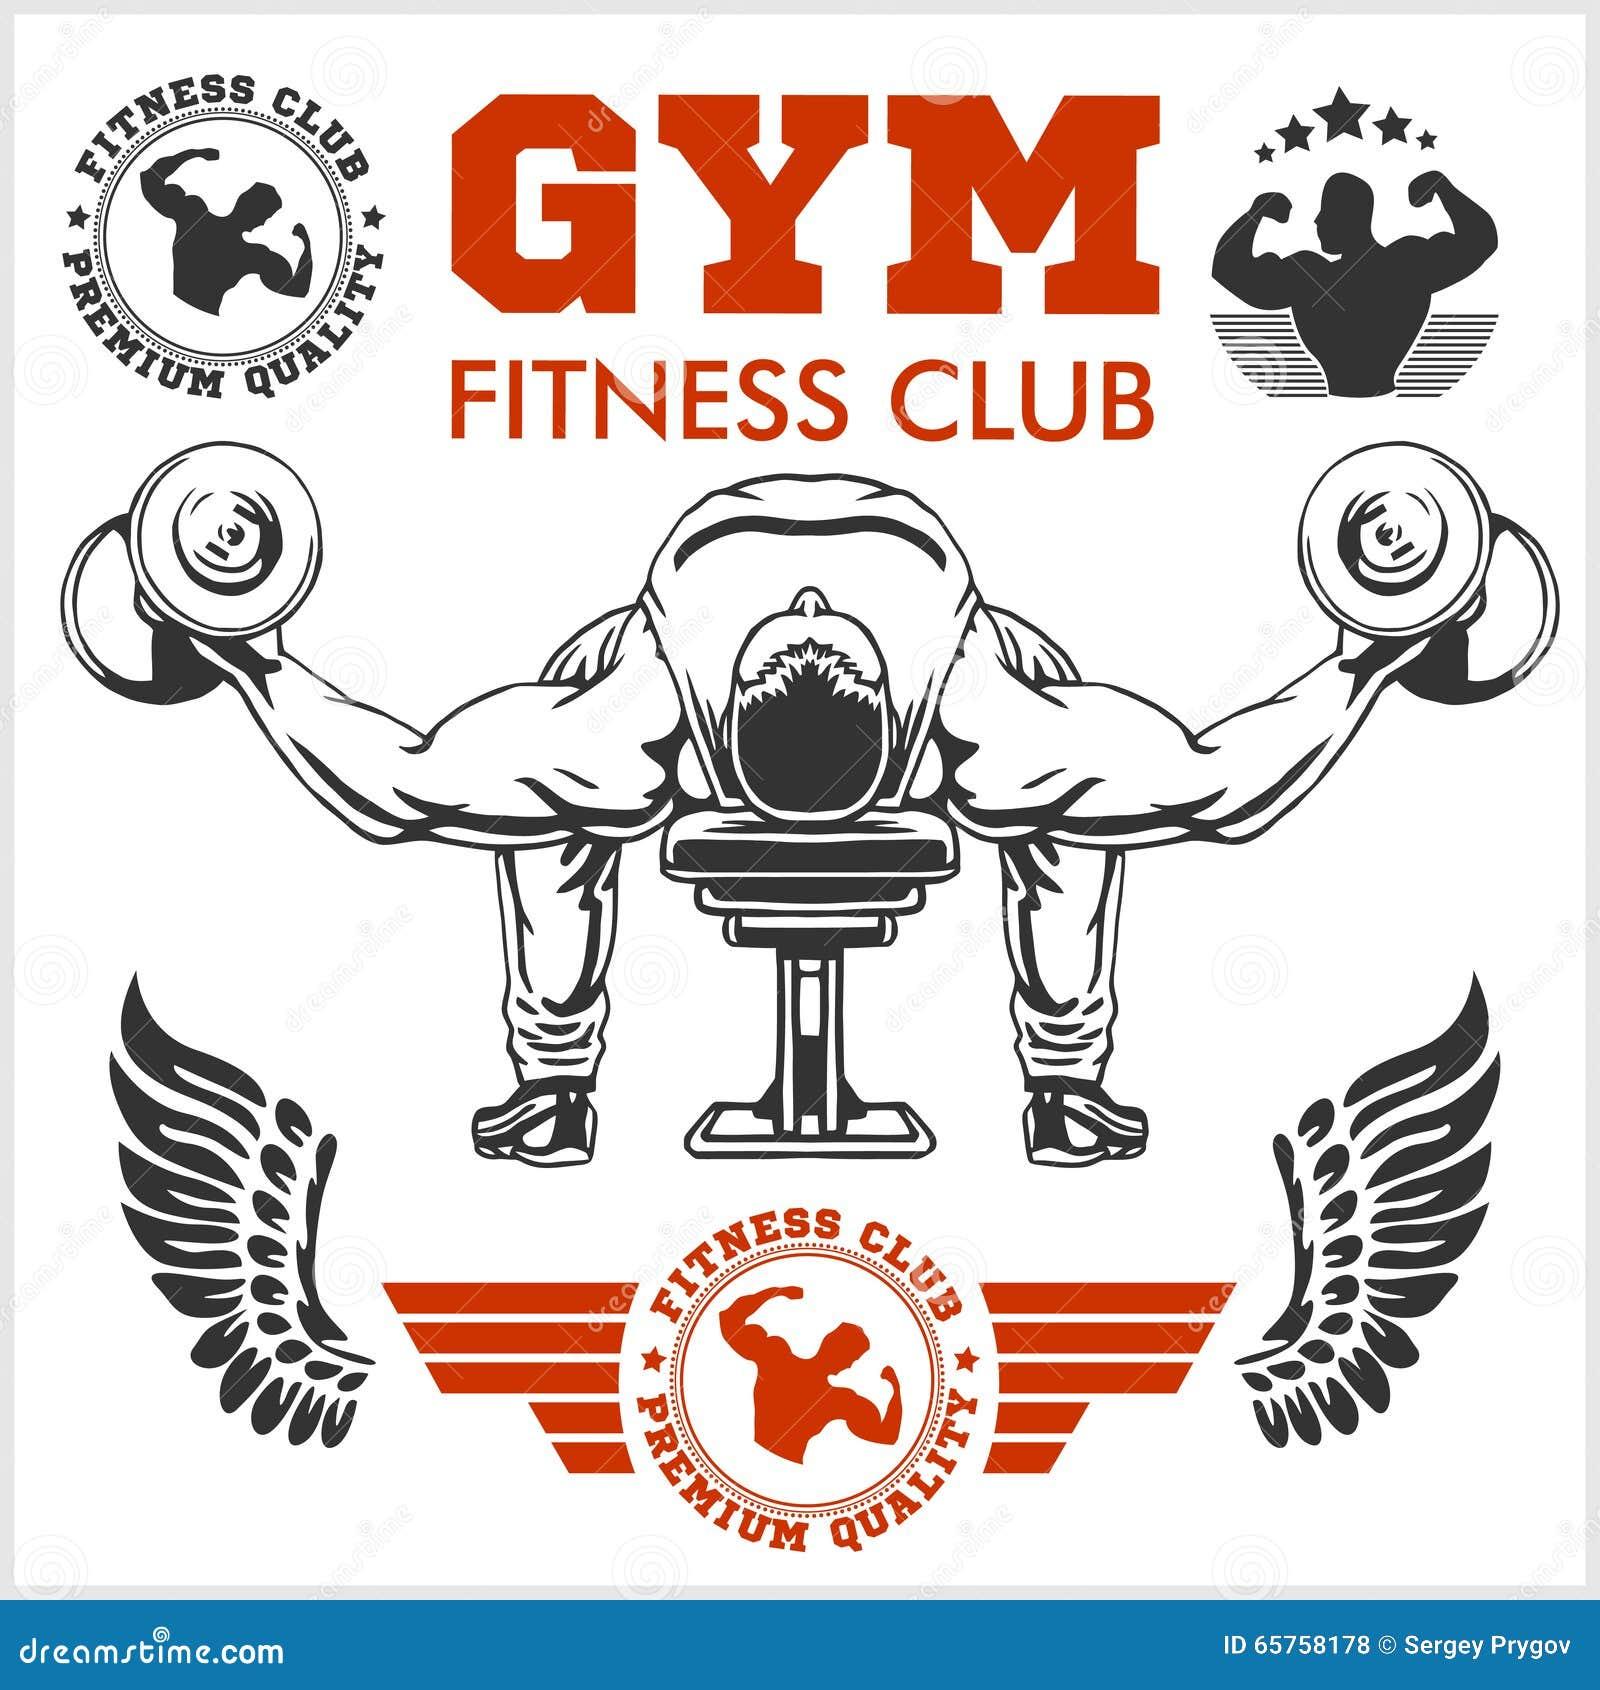 Gym Equipment Logo: Bodybuilder And Bodybuilding Fitness Logos Emblems. Sports